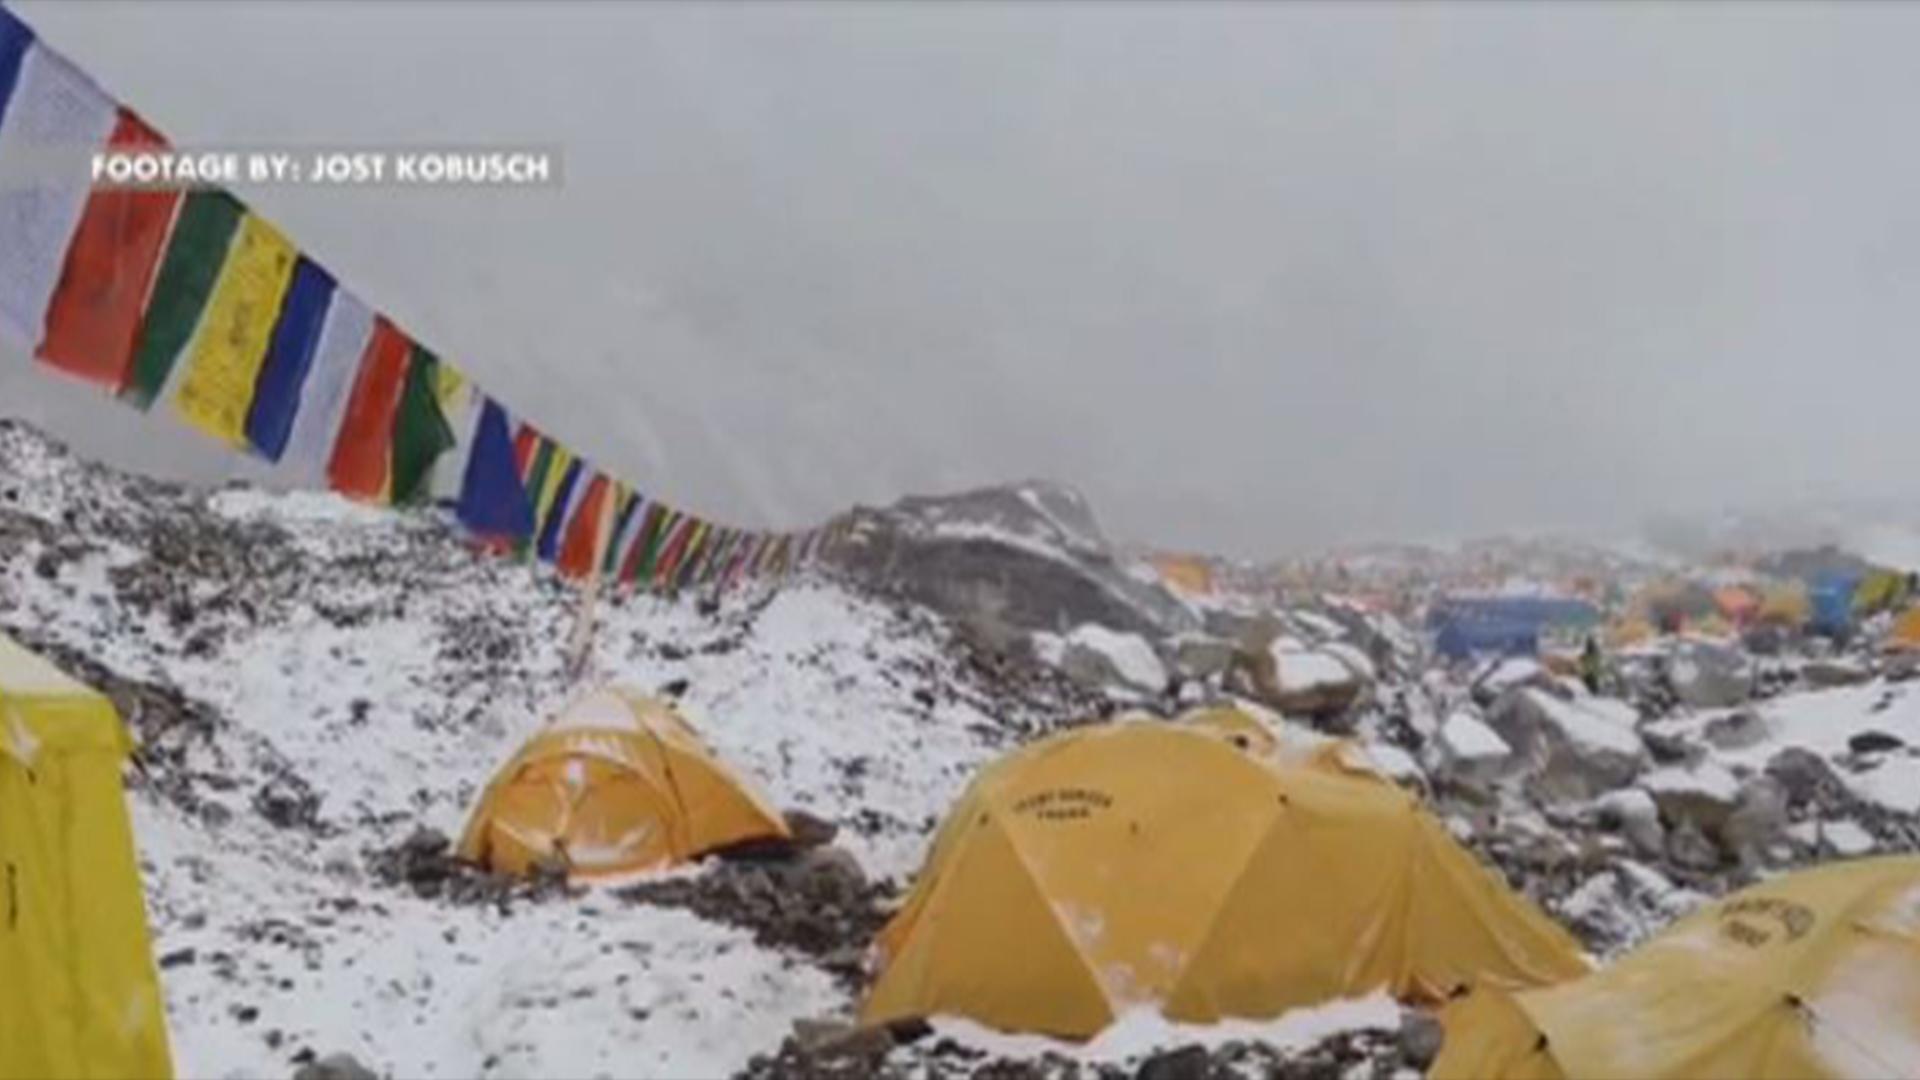 Surviving the Everest avalanche